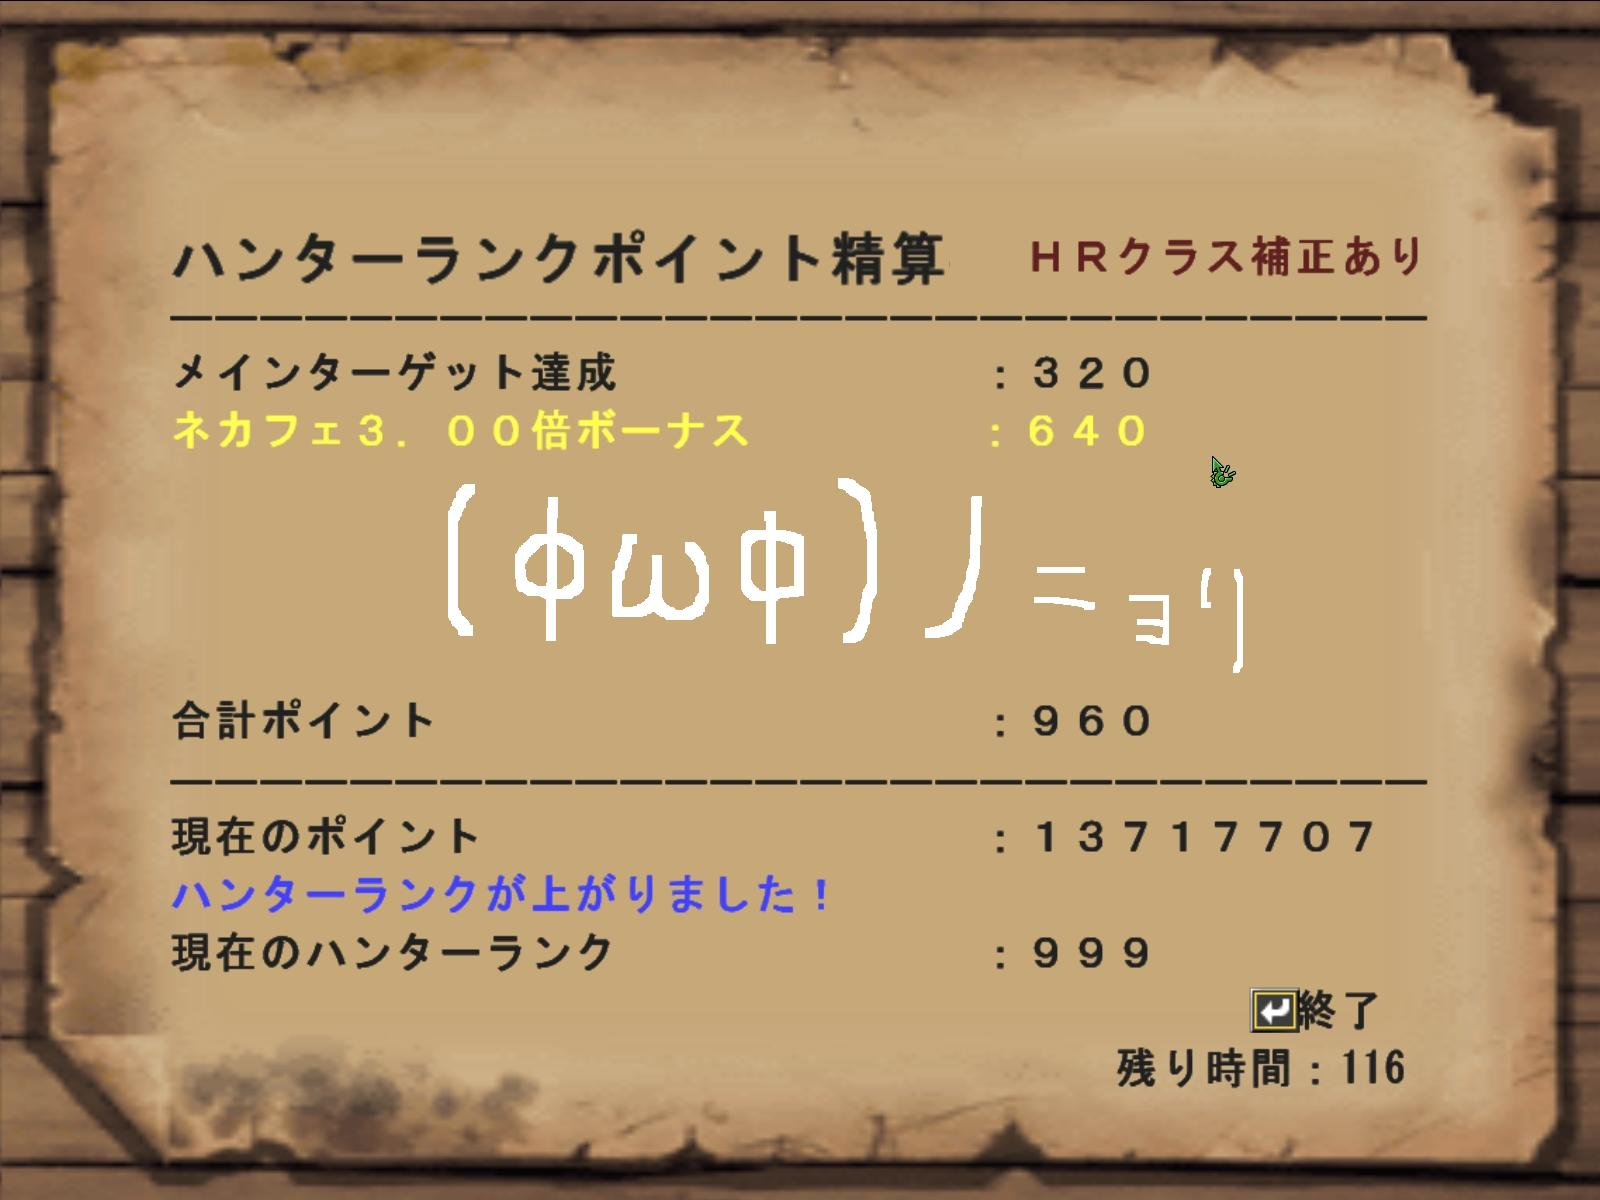 mhf_20110428_070114_718.jpg